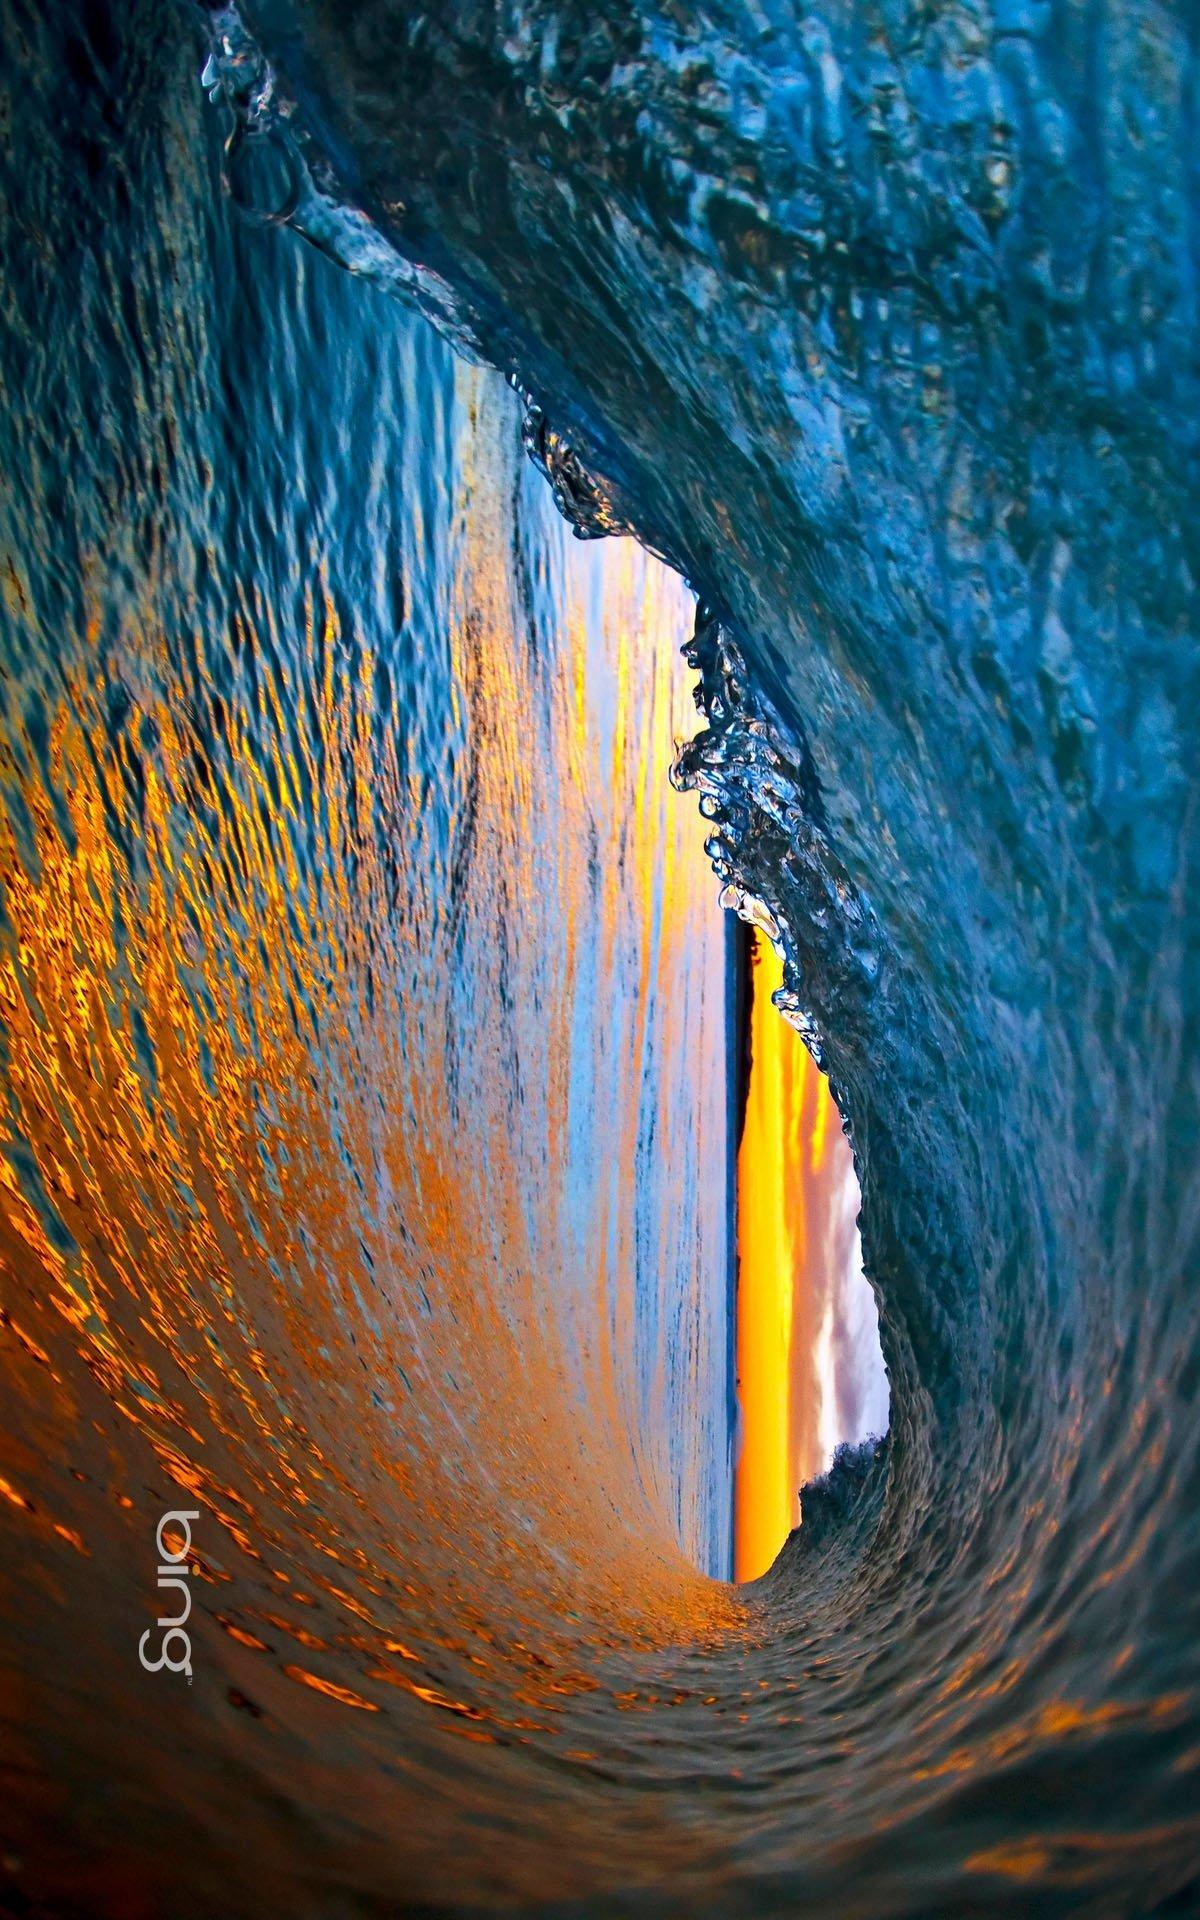 Ocean waves near Ventura, California